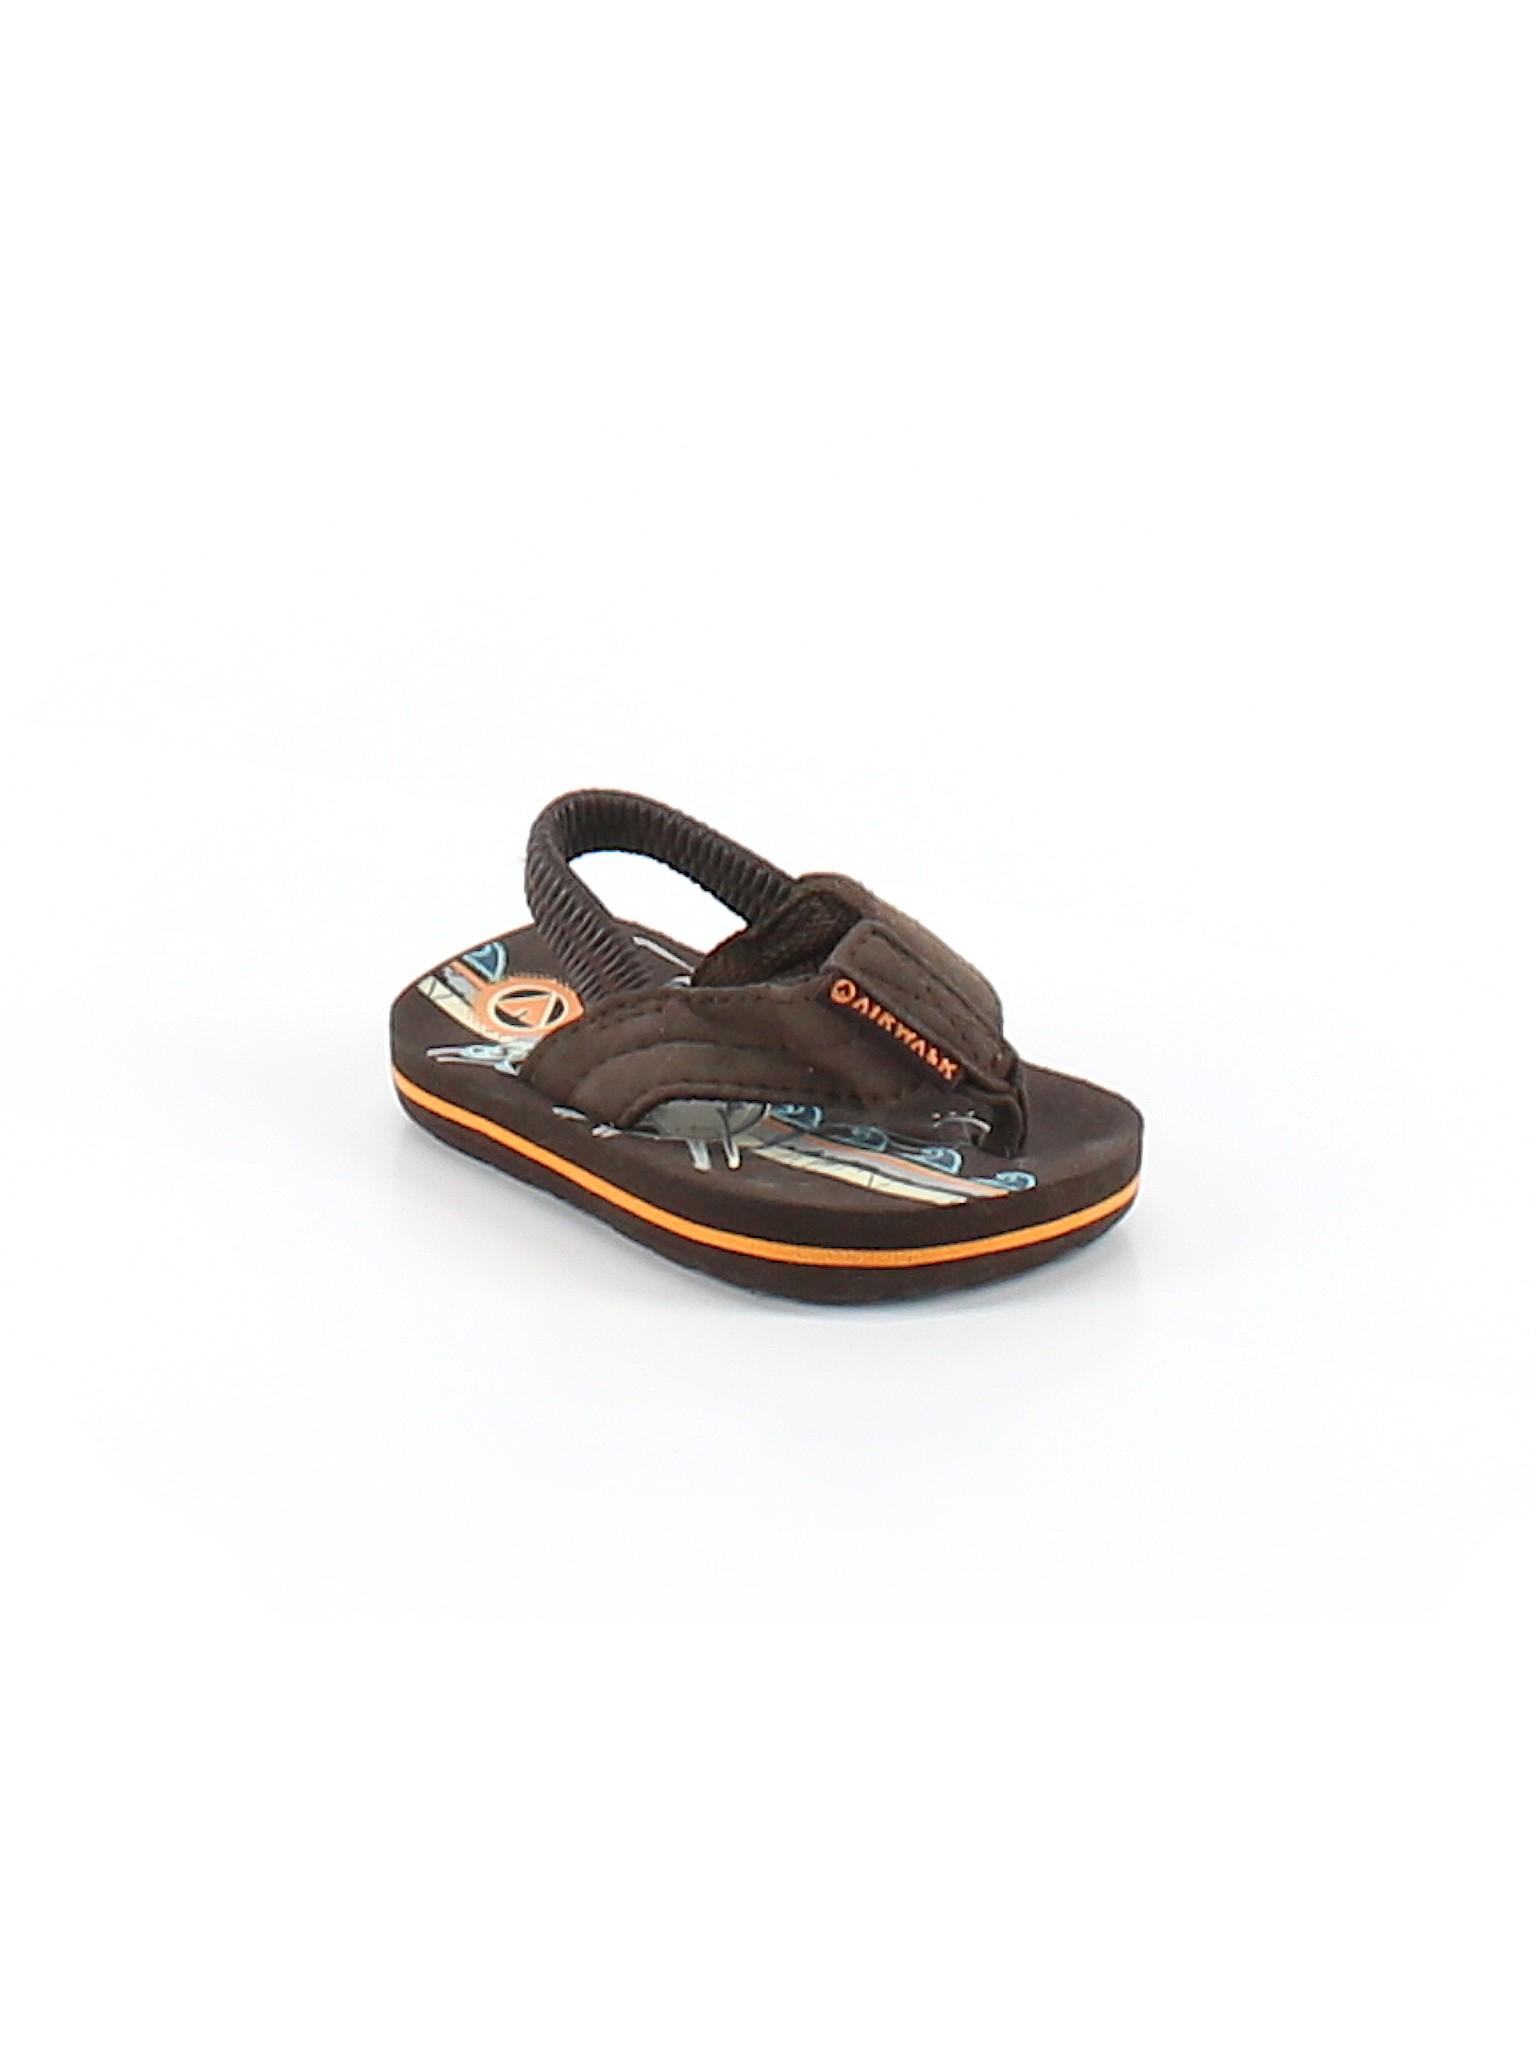 276ab8ee9d5e7 Airwalk Solid Brown Flip Flops Size 1 - 44% off